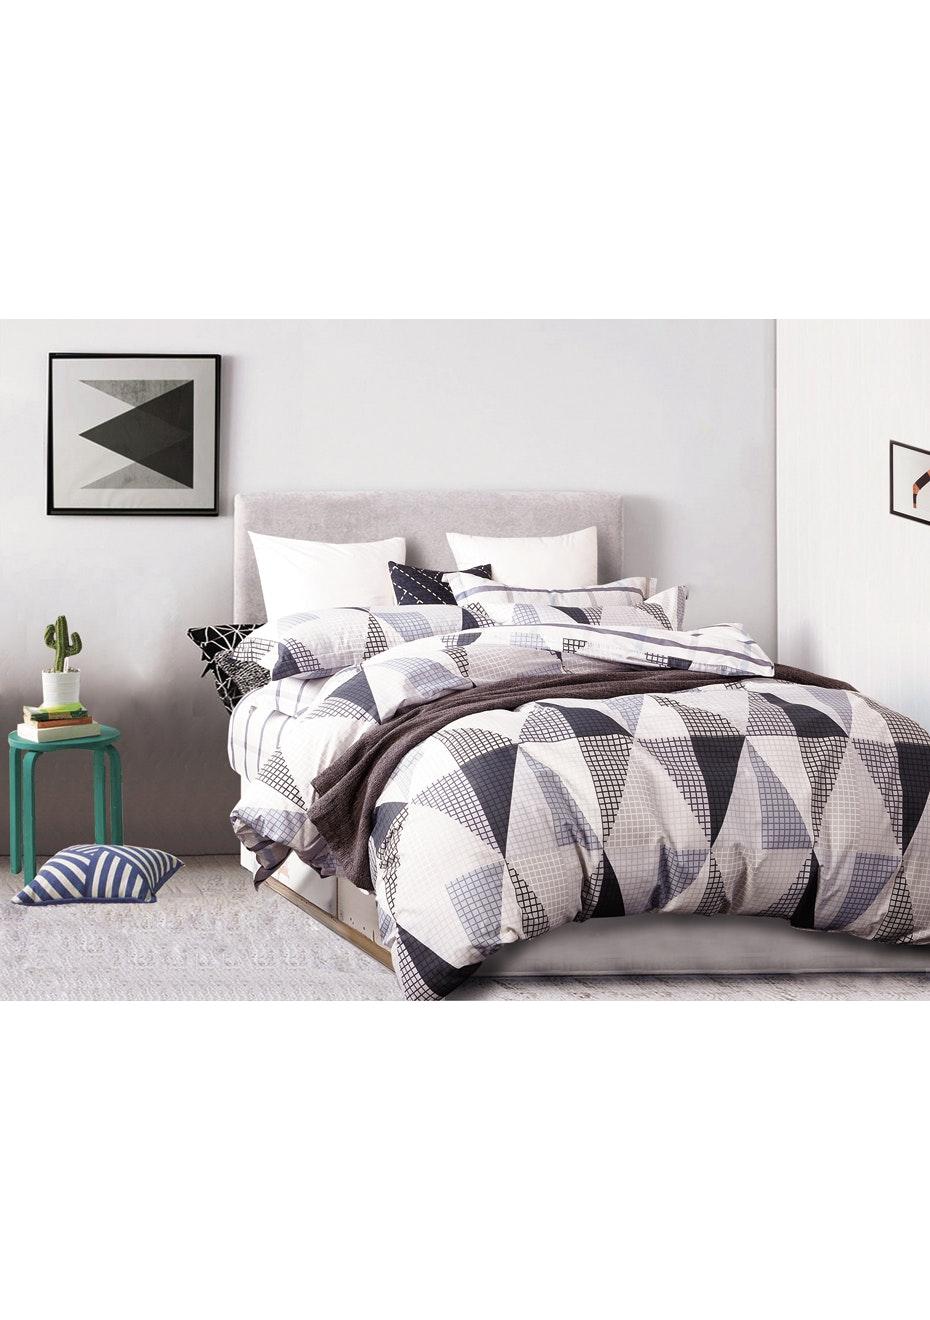 Altona Quilt Cover Set - Reversible Design - 100% Cotton - Queen Bed